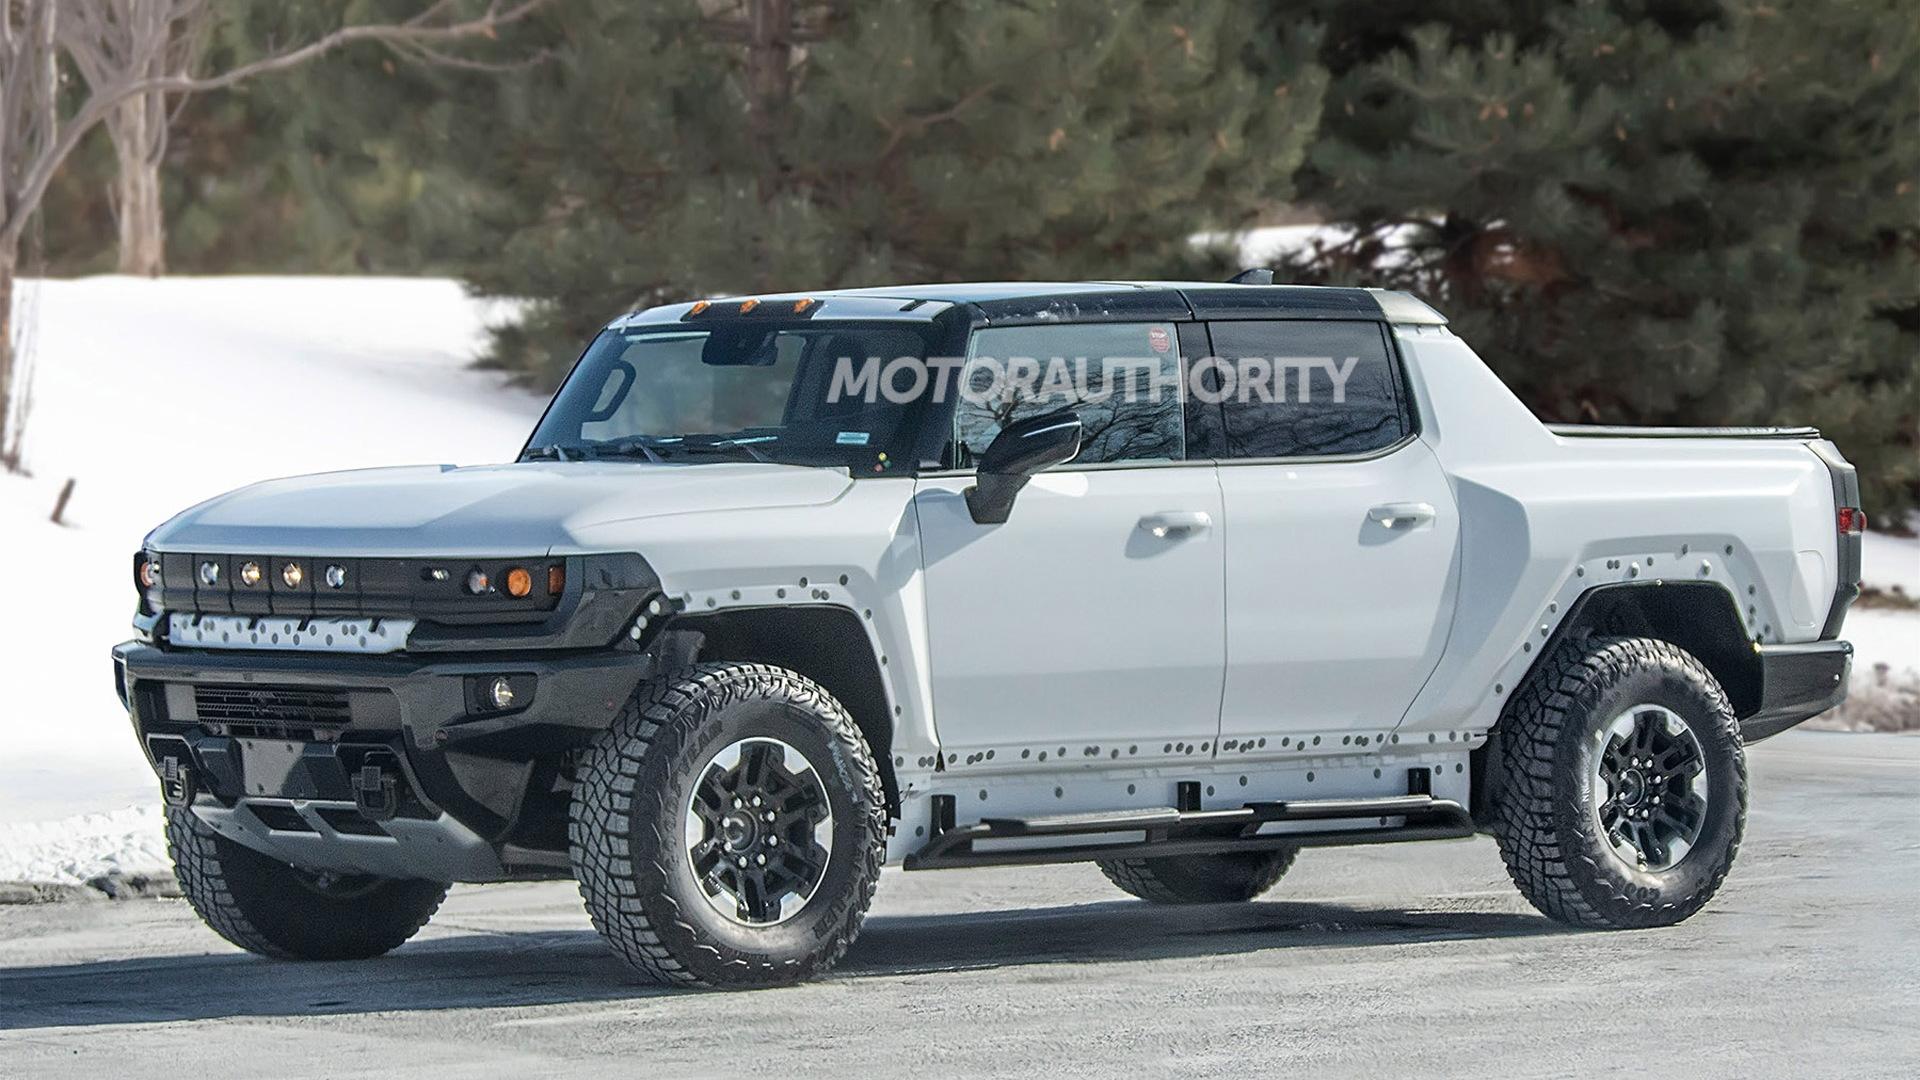 2022 GMC Hummer EV spy shots - Photo credit:S. Baldauf/SB-Medien